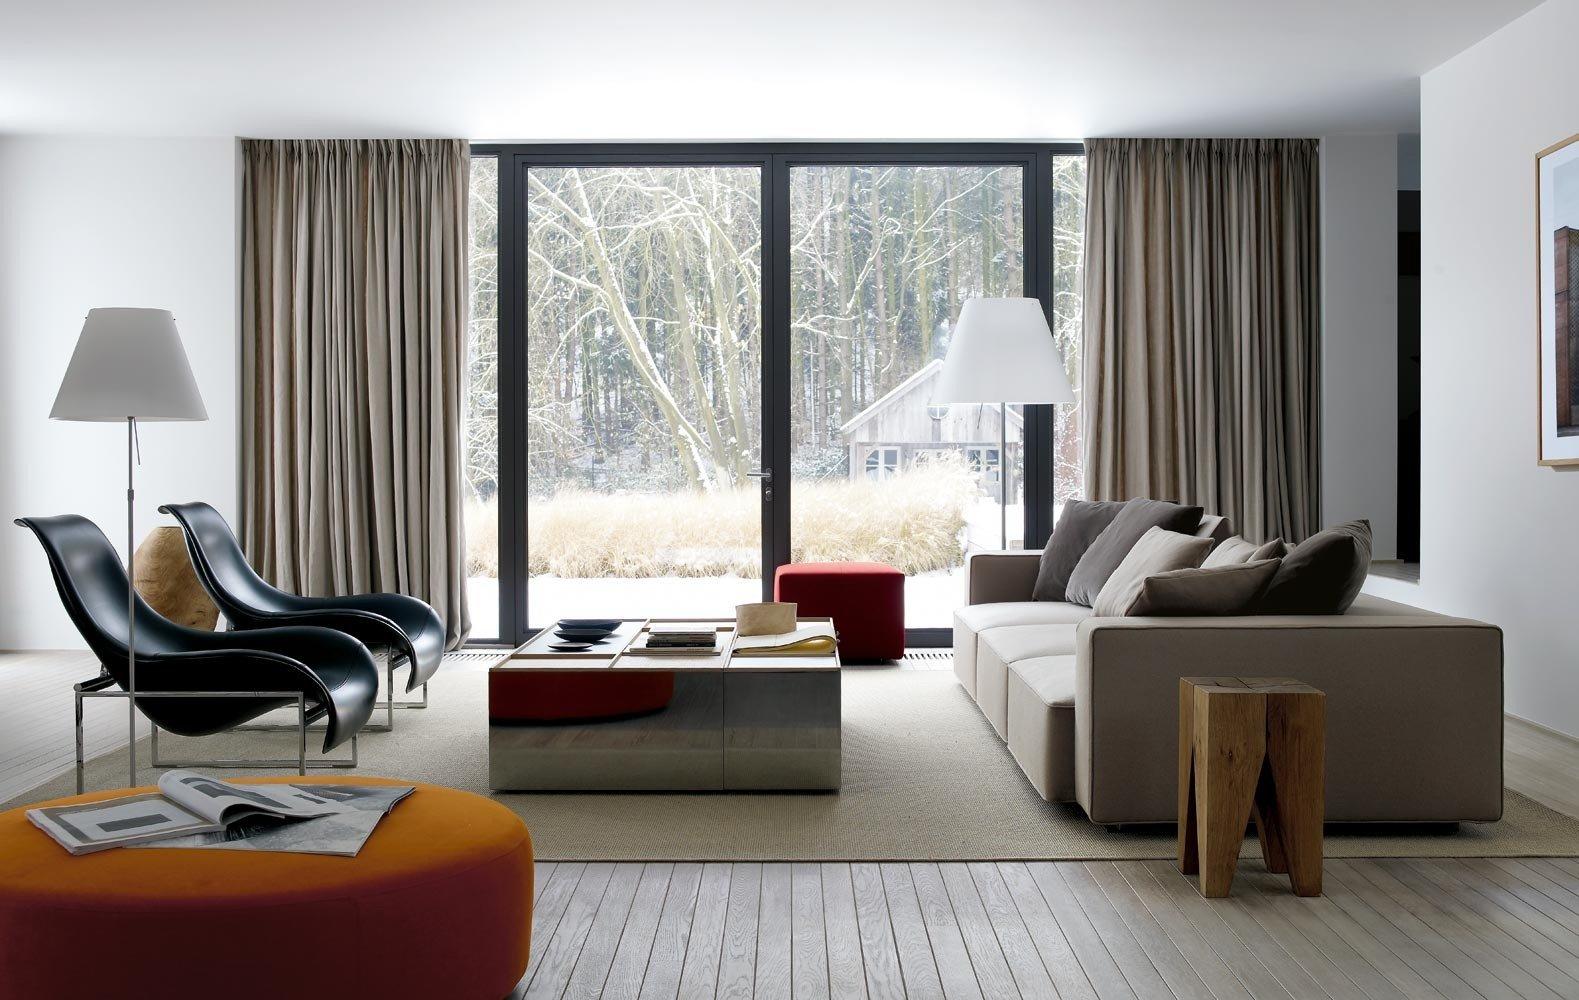 Modern Chair Living Room Decorating Ideas sofa Ideas